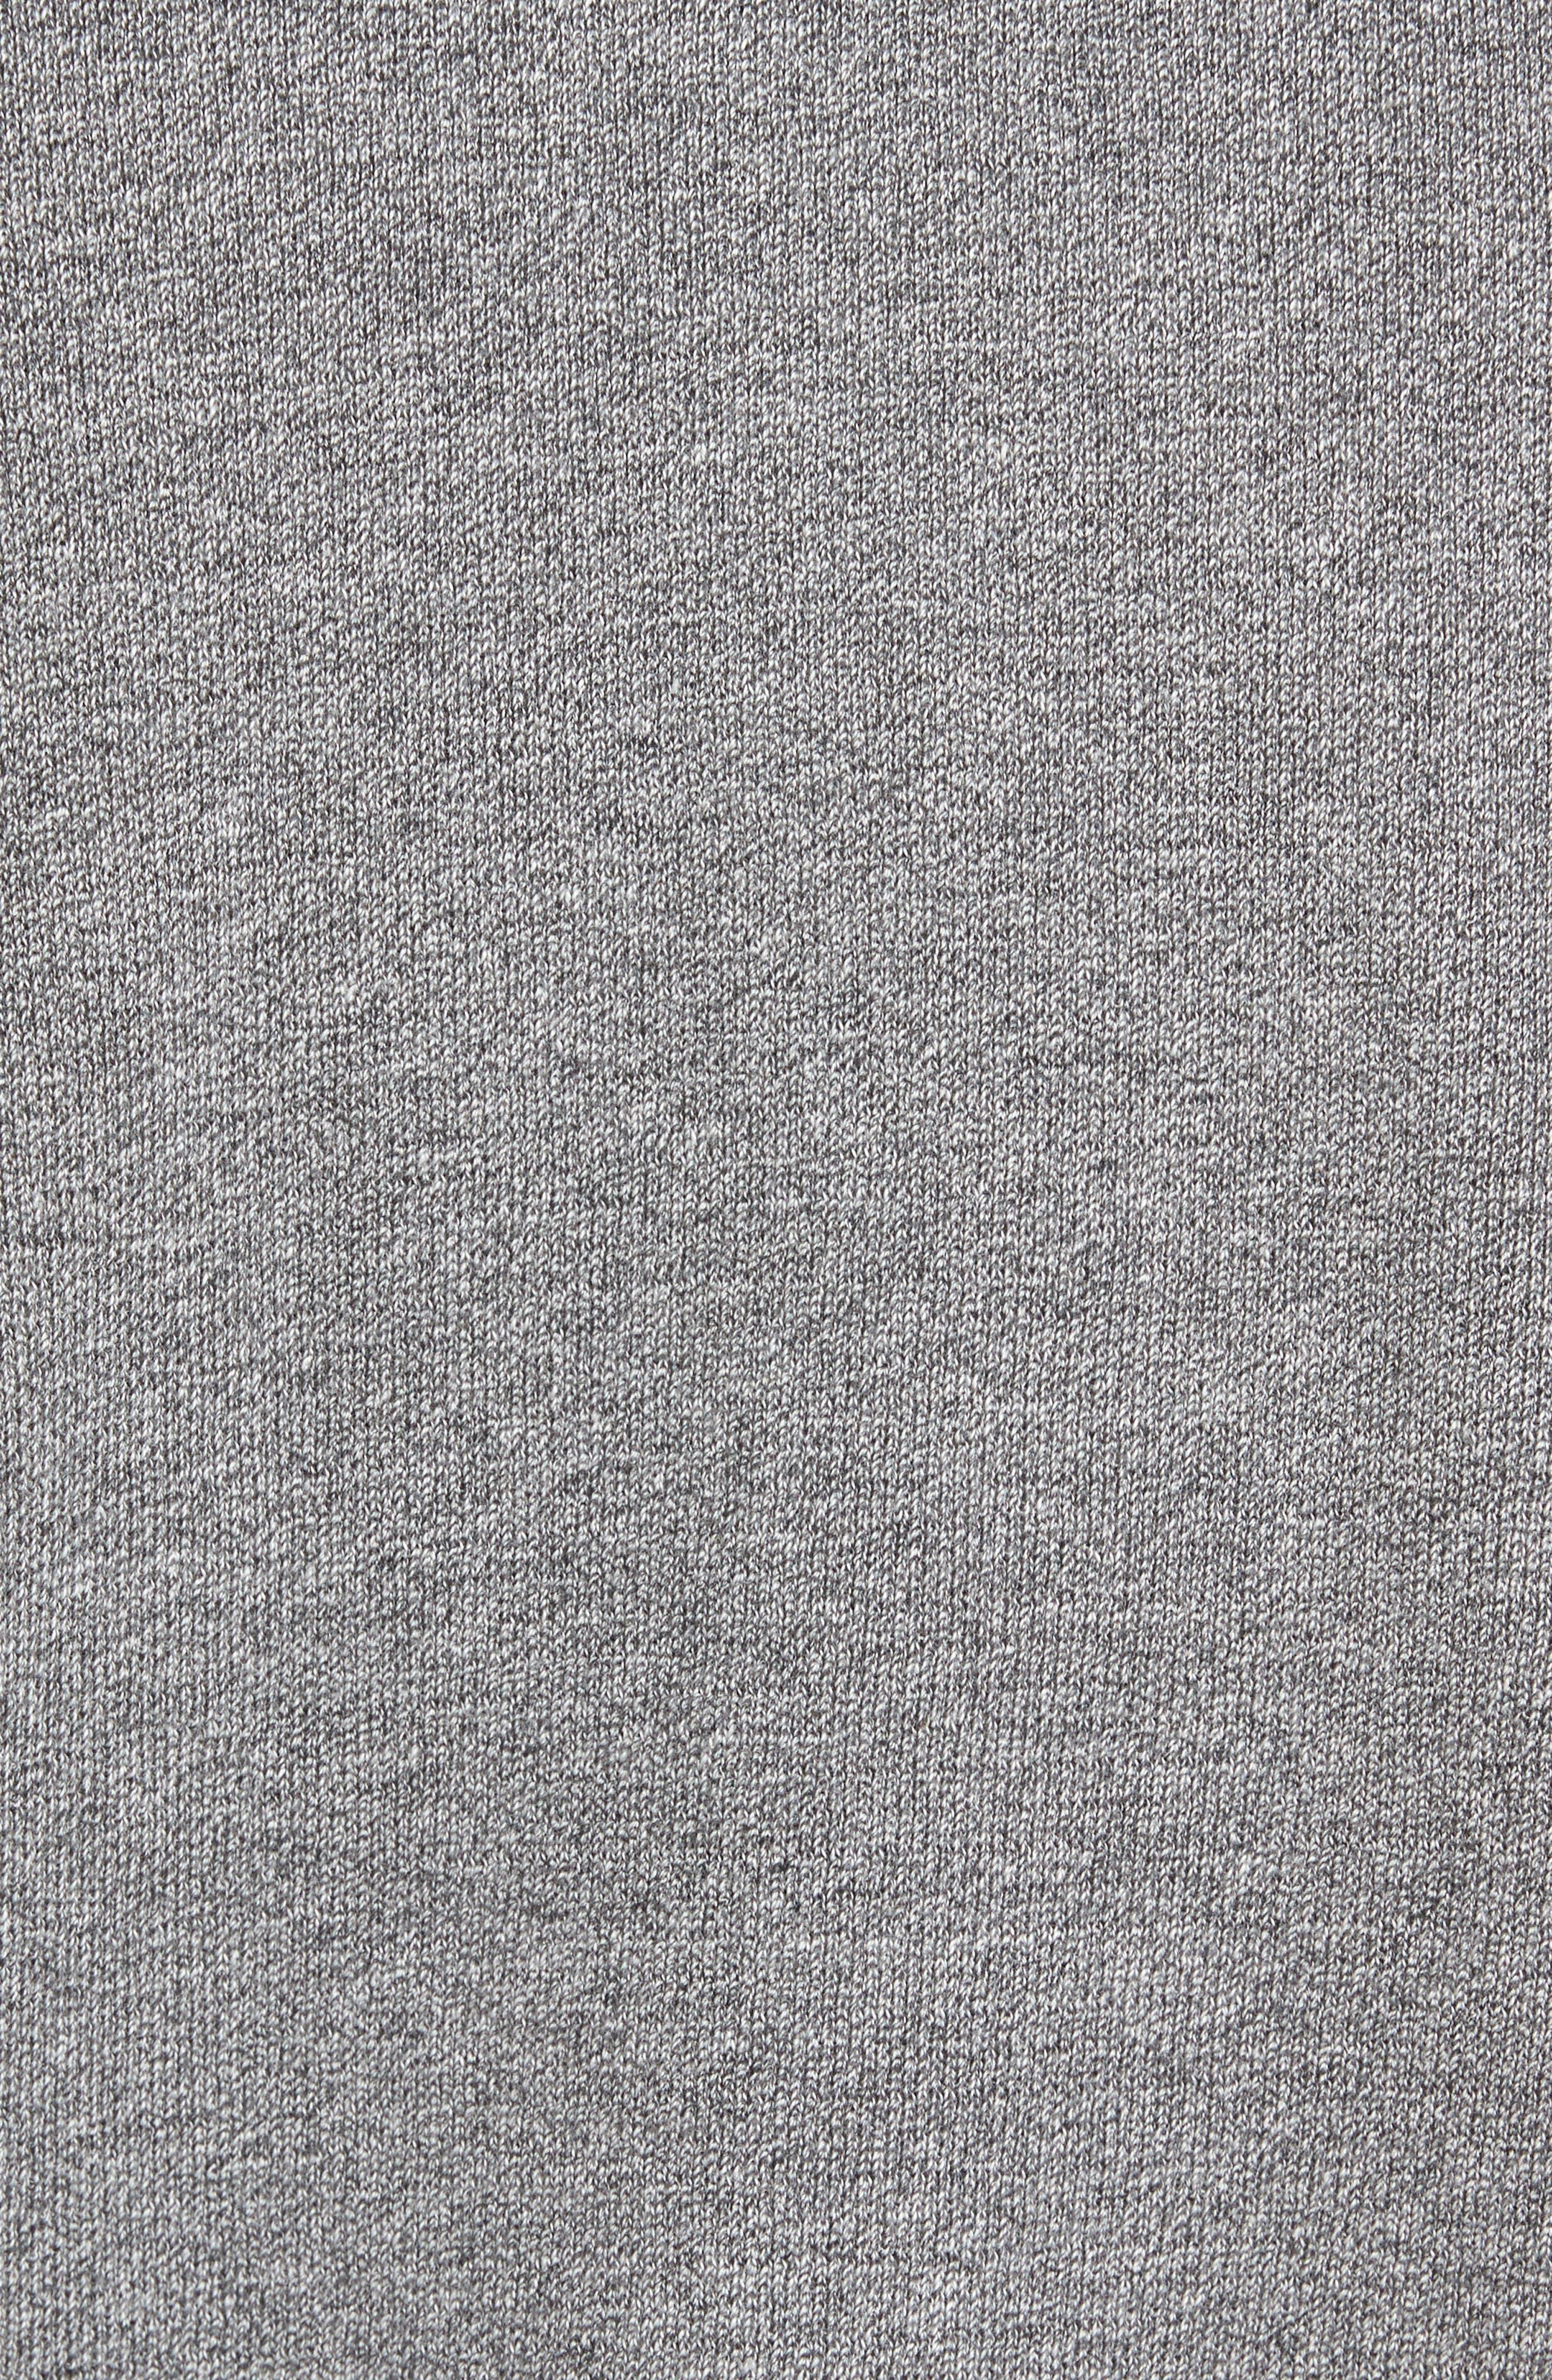 NFL Stitch of Liberty Embroidered Crewneck Sweatshirt,                             Alternate thumbnail 127, color,